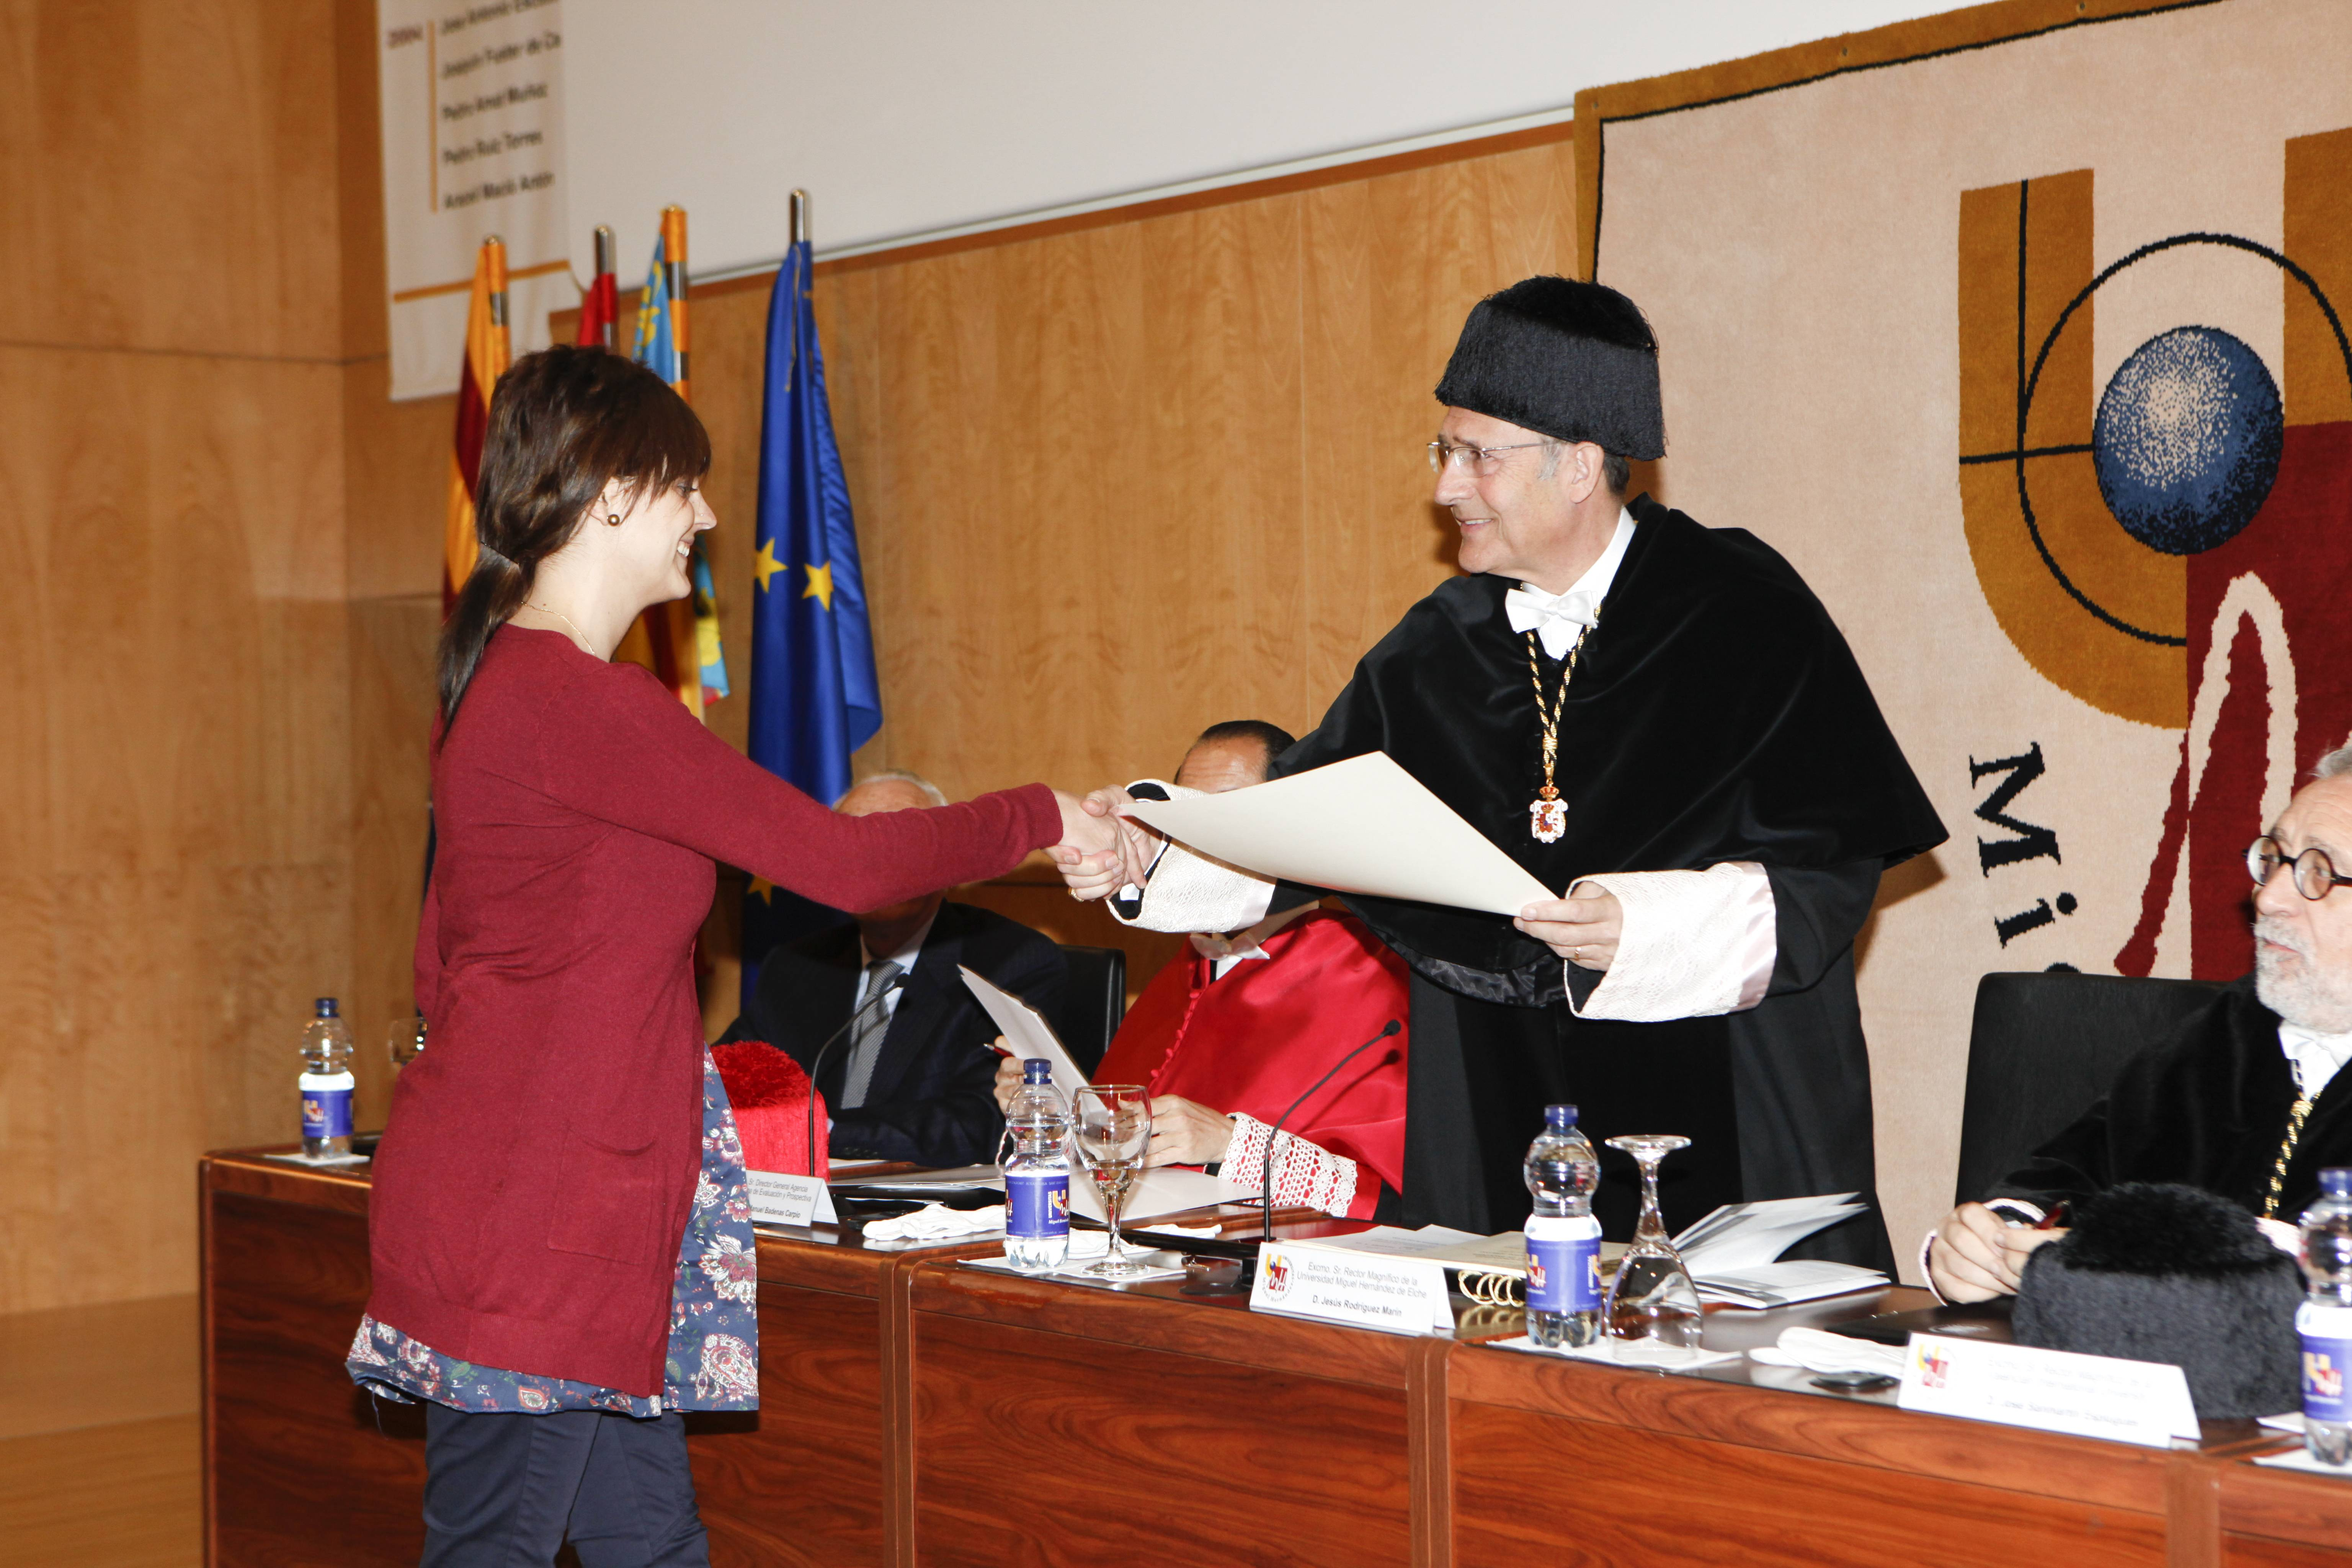 doctor-honoris-causa-luis-gamir_mg_0905.jpg